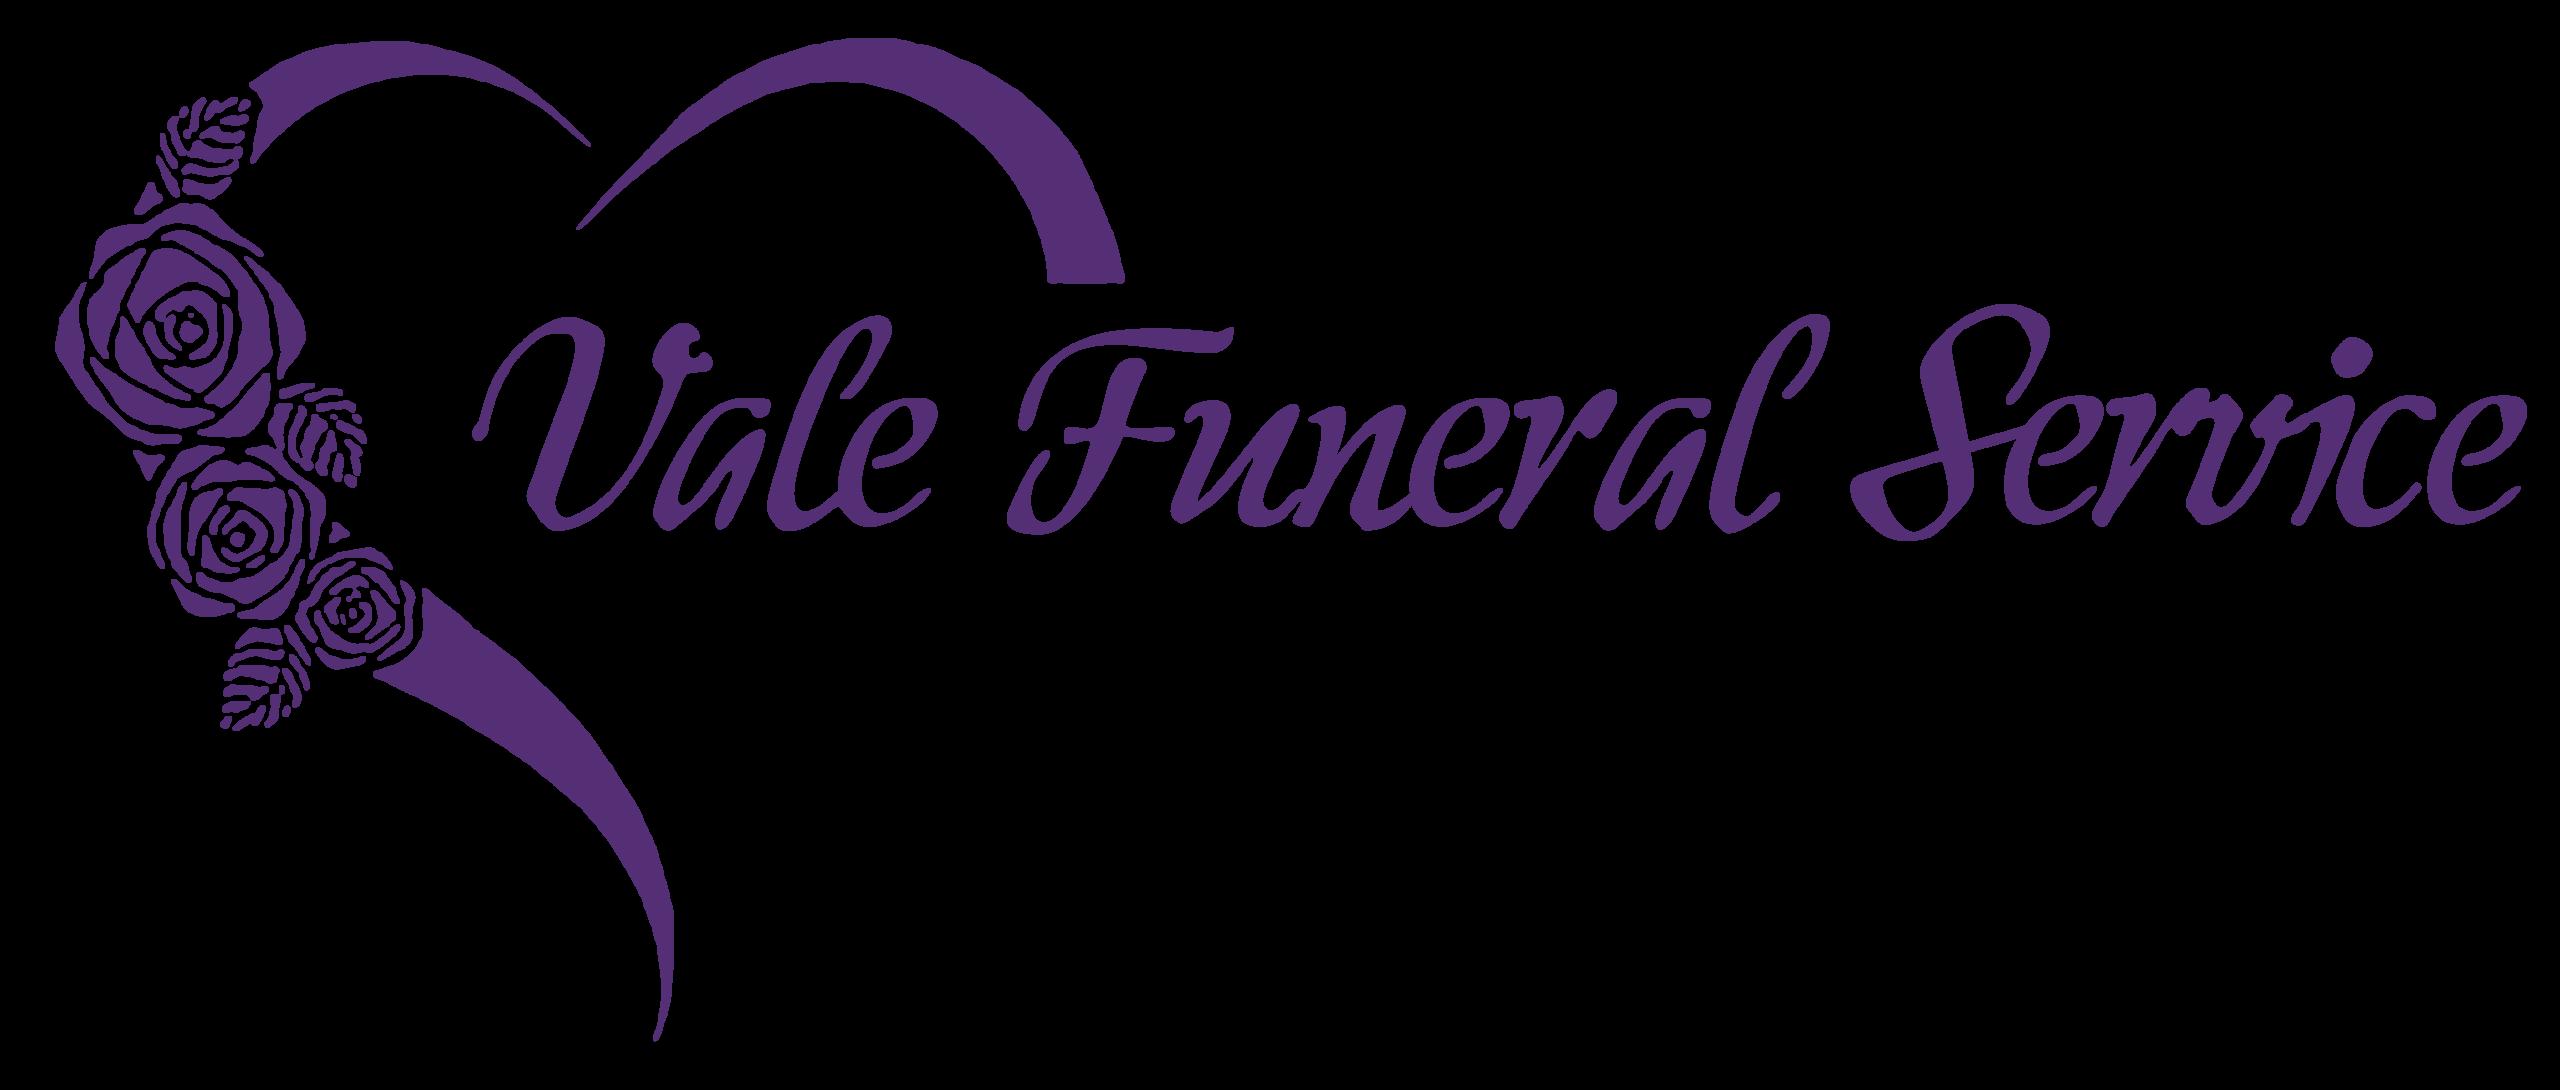 Funeral clipart funeral procession. Service etiquette barry vale